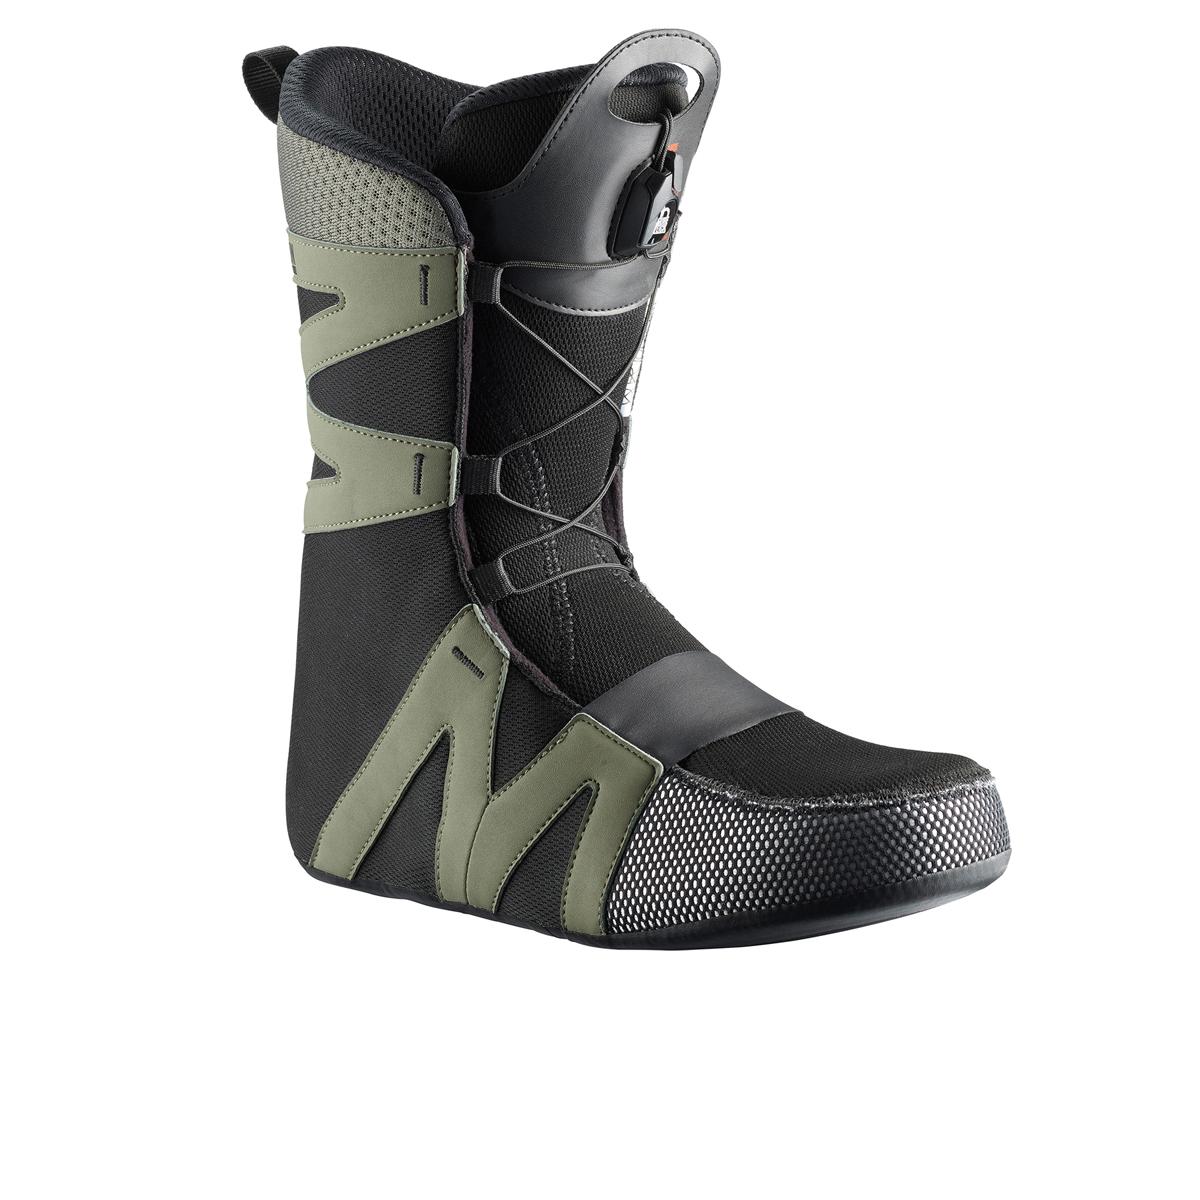 Salomon LO FI Snowboard Boot